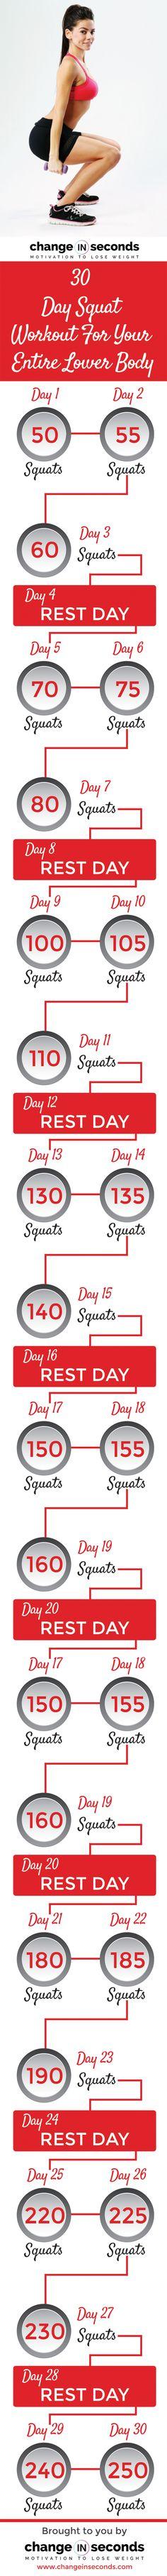 Fitness Motivation : 30 Day Squat Challenge www. Fitness Workouts, Yoga Fitness, Quotes Fitness, Fitness Workout For Women, Fun Workouts, Fitness Diet, Morning Workouts, Health Fitness, Free Fitness